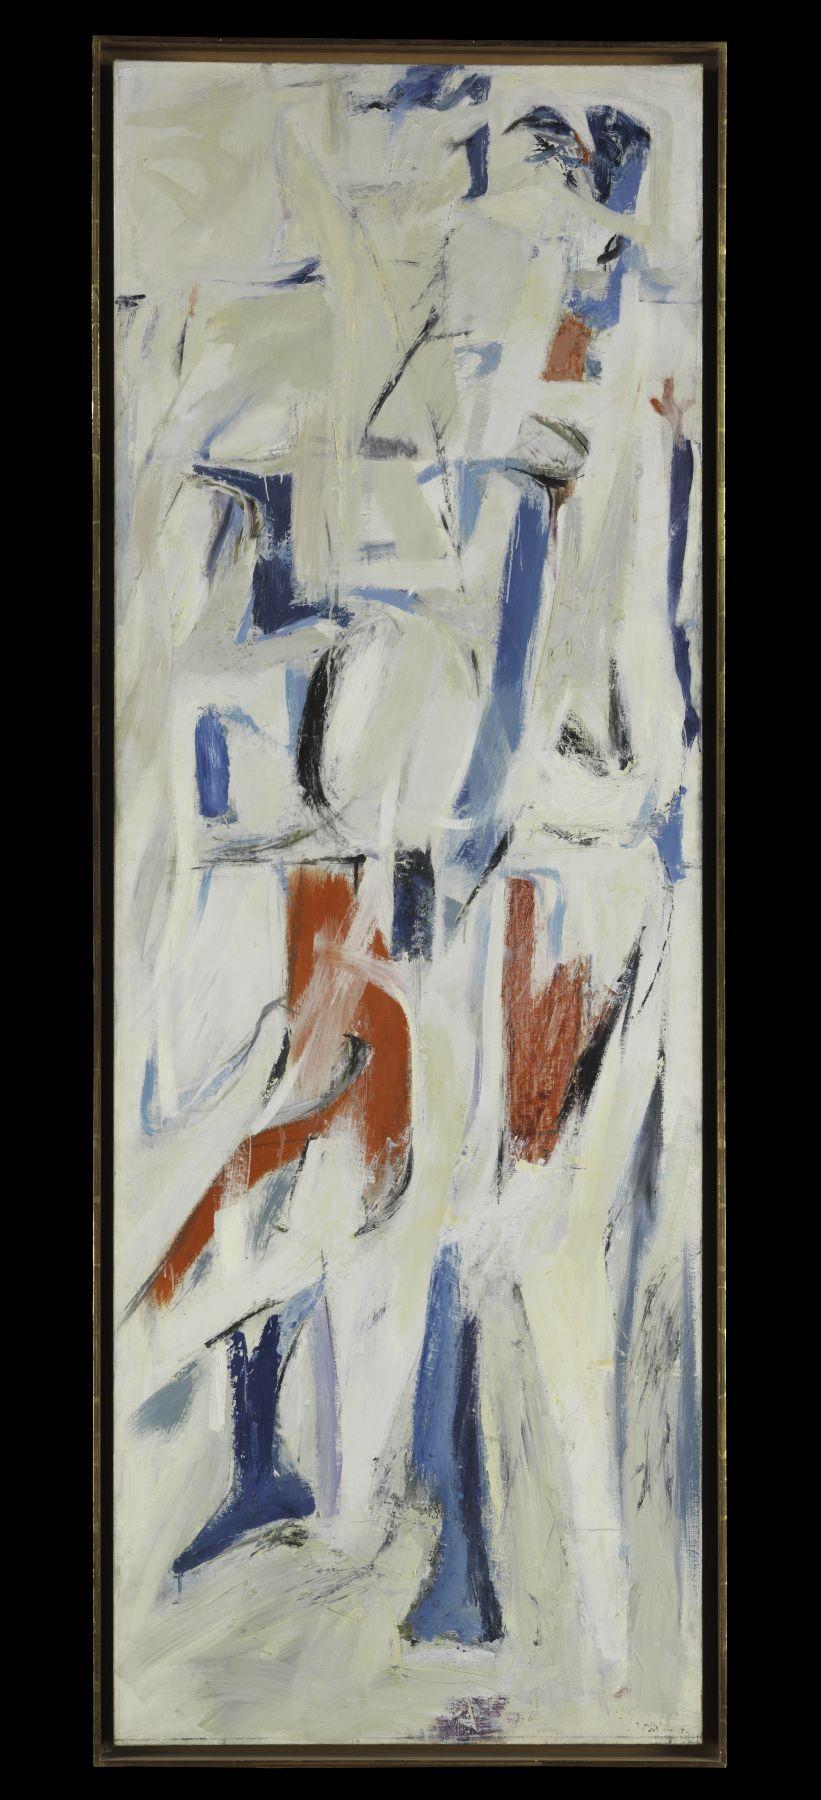 Adagio, 1953, Oil on canvas